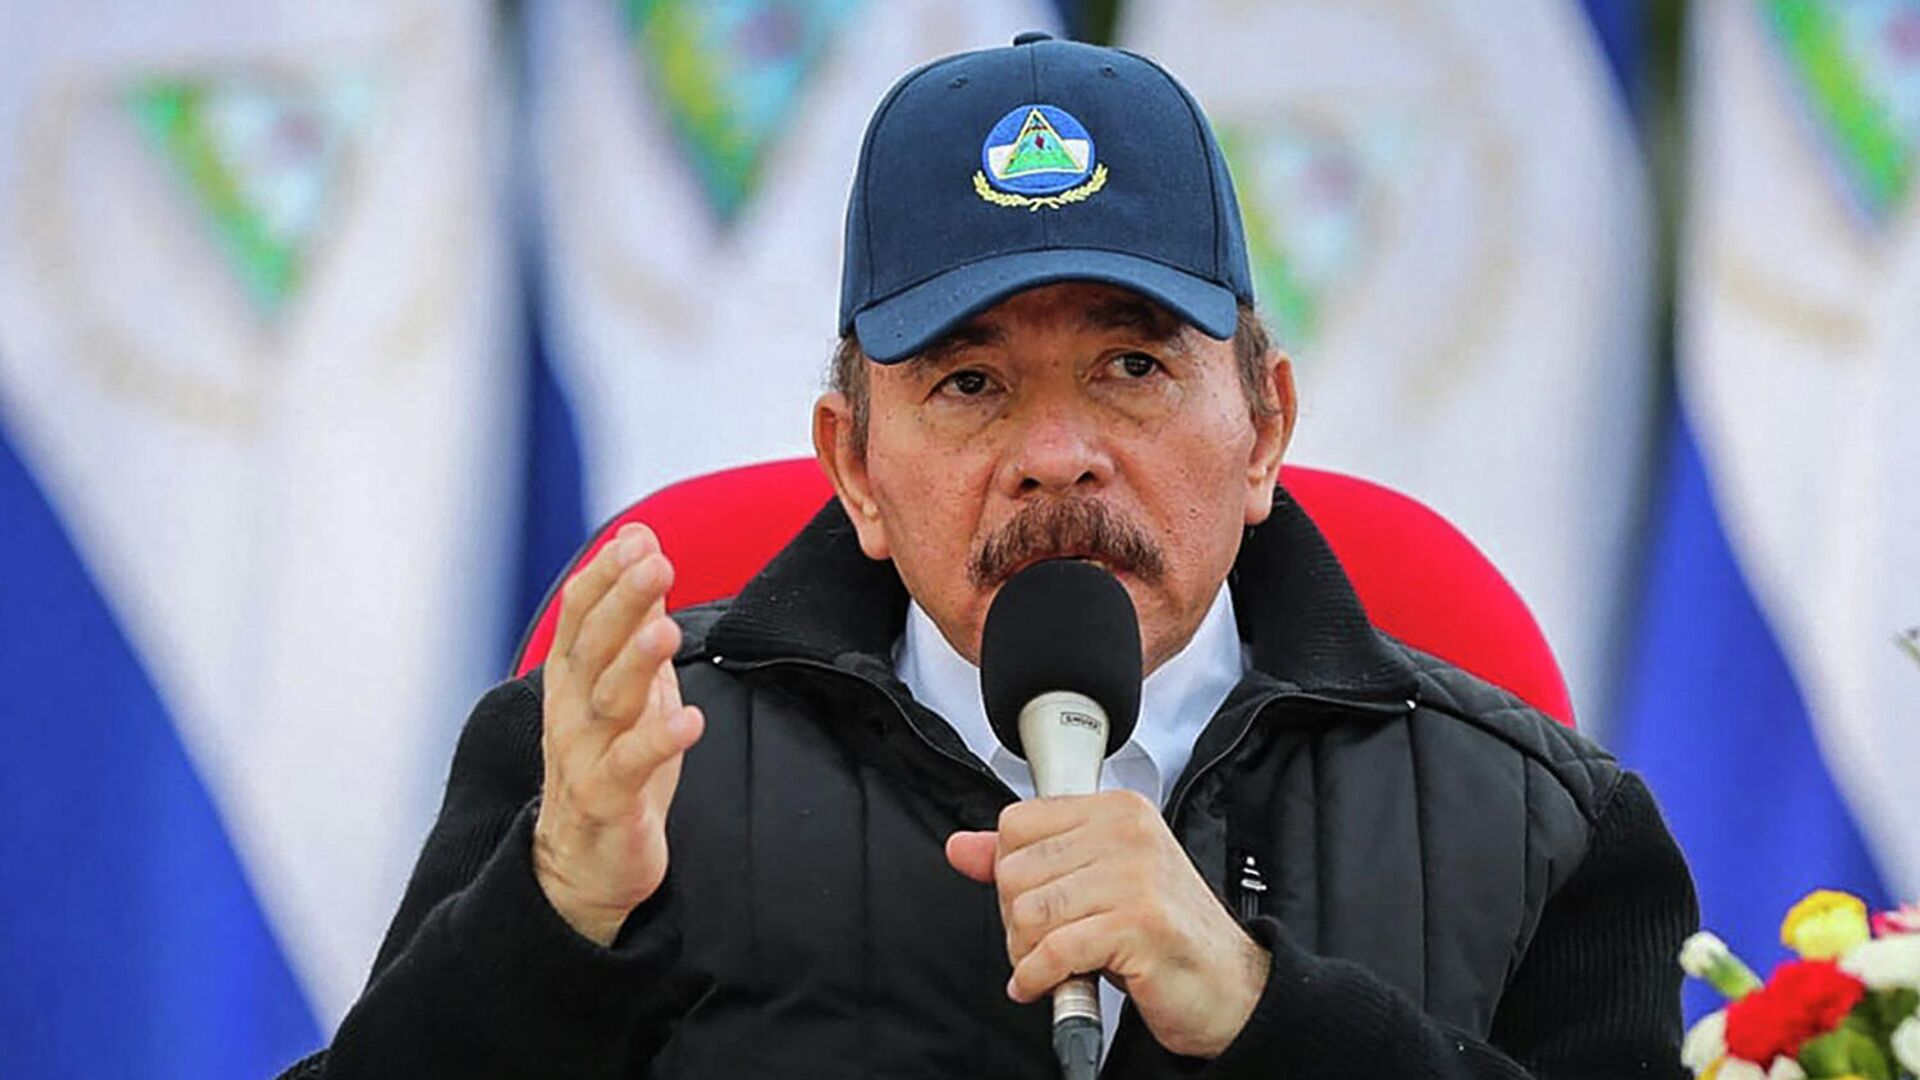 Daniel Ortega, presidente de Nicaragua - Sputnik Mundo, 1920, 12.10.2021